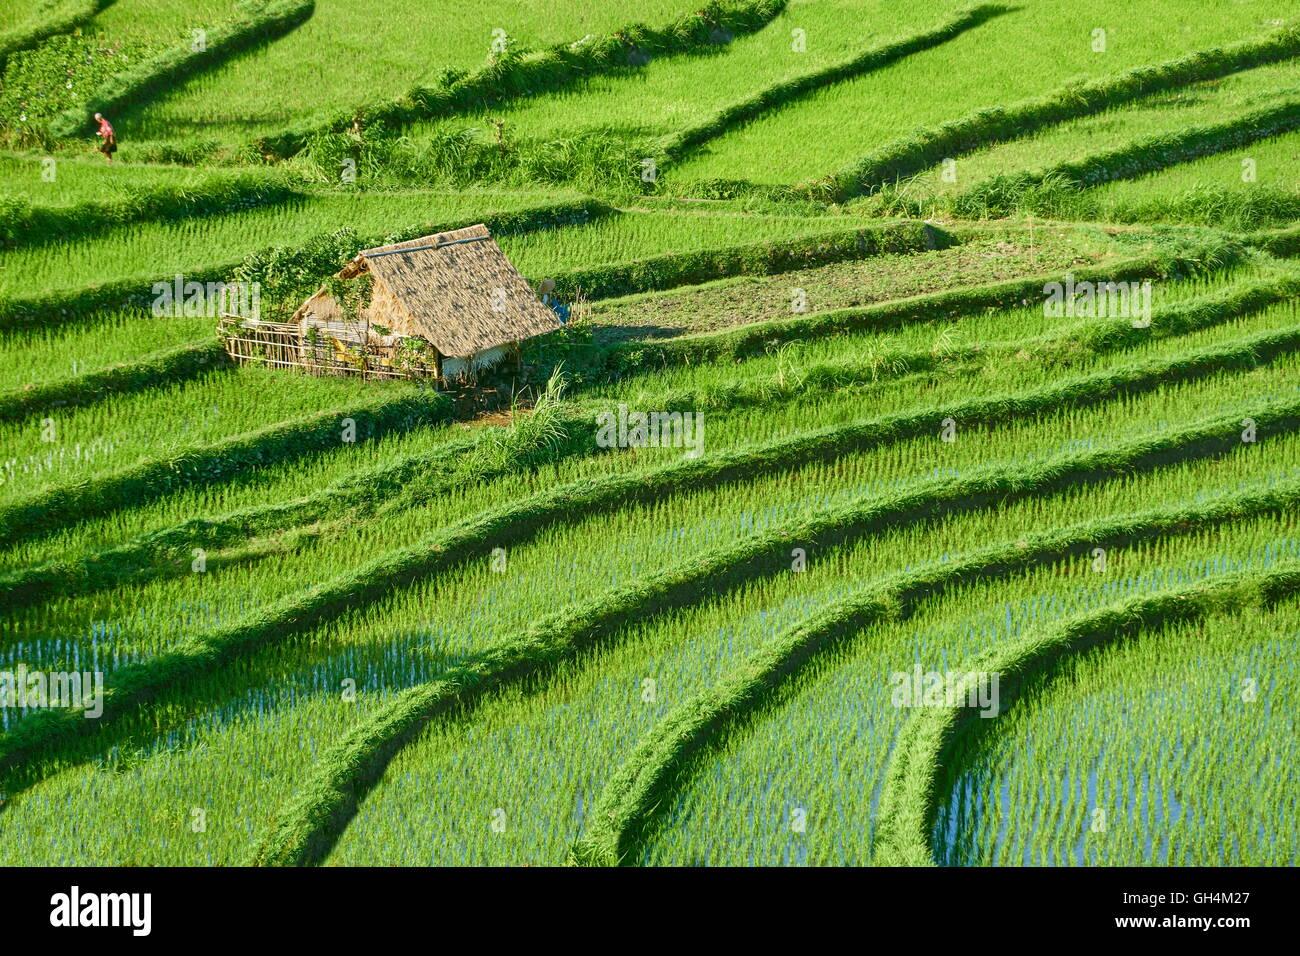 Terrasses de riz Champ, Bali, Indonésie Photo Stock